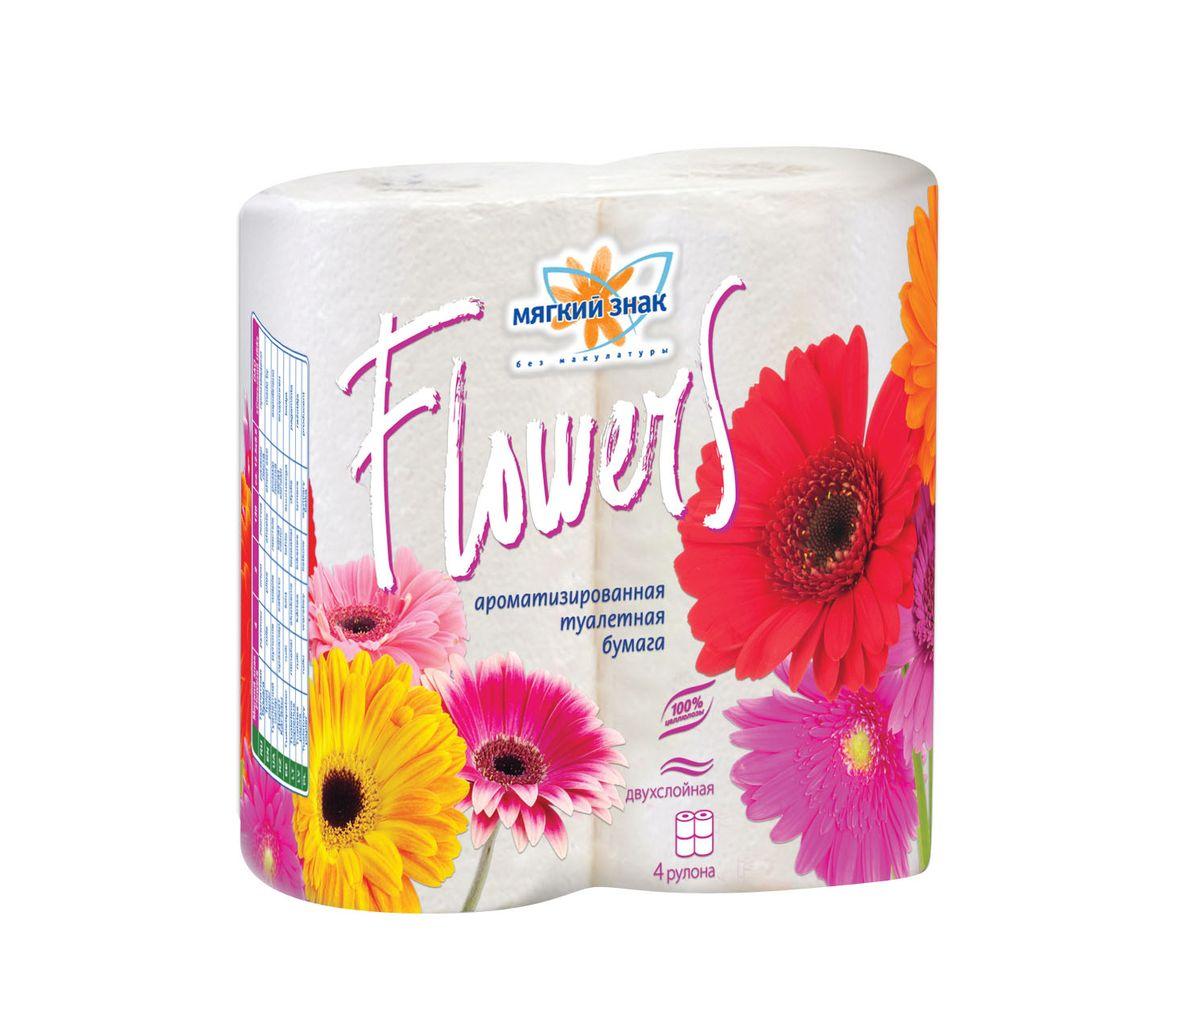 Туалетная бумага Мягкий знак Flowers, ароматизированная, двухслойная, цвет: белый, 4 рулона бумага туалетная мягкий знак deluxe 2 ух слойная без отдушки 4 шт